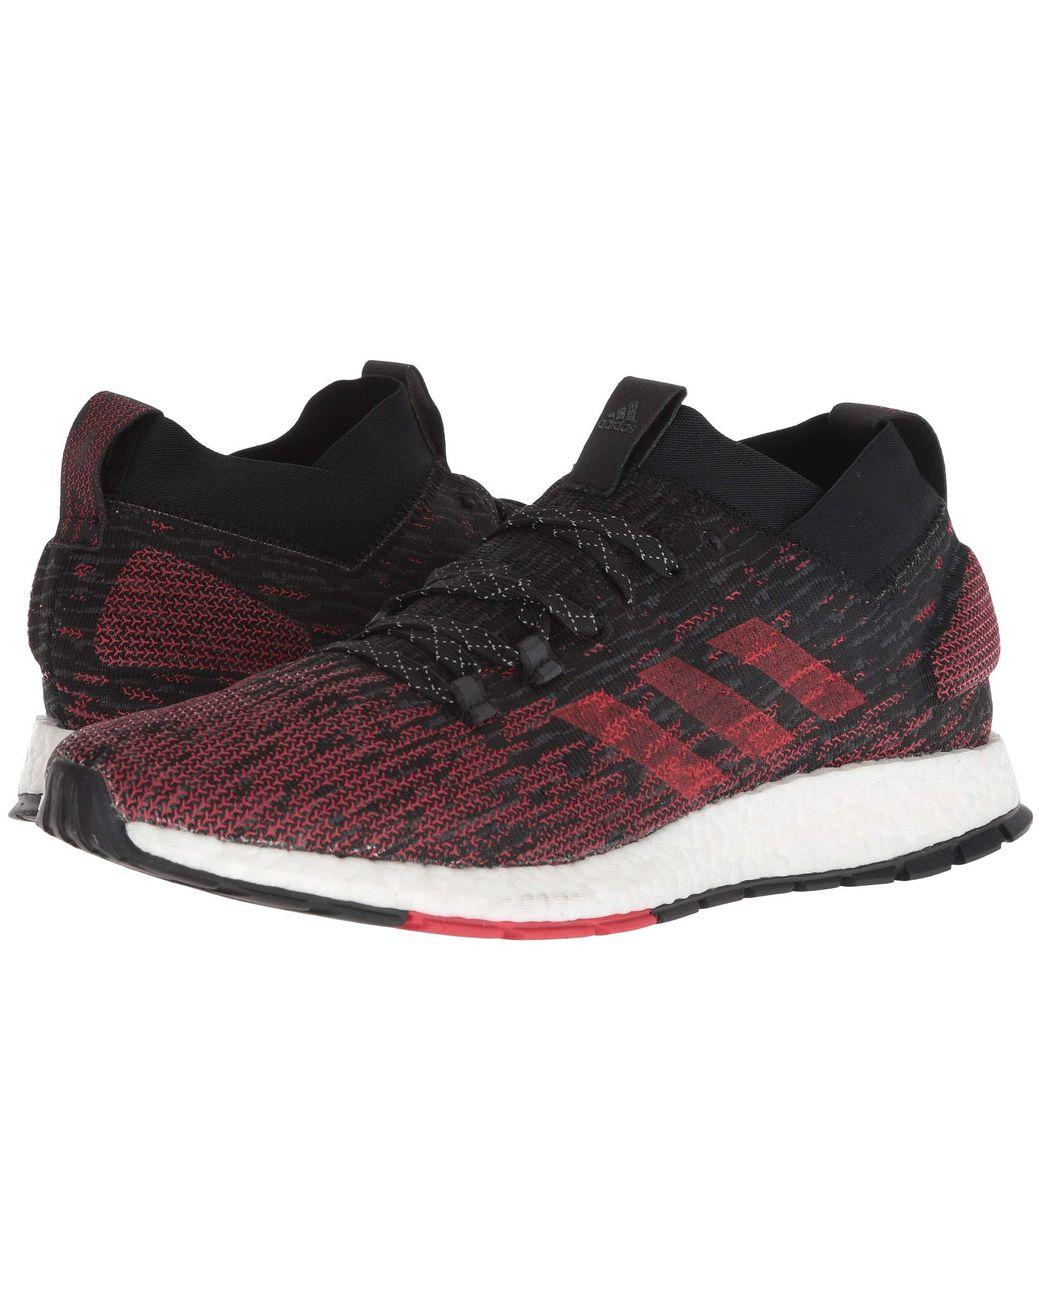 1dd945025 Lyst - adidas Originals Pureboost Rbl (carbon core Black active Red) Men s  Running Shoes for Men